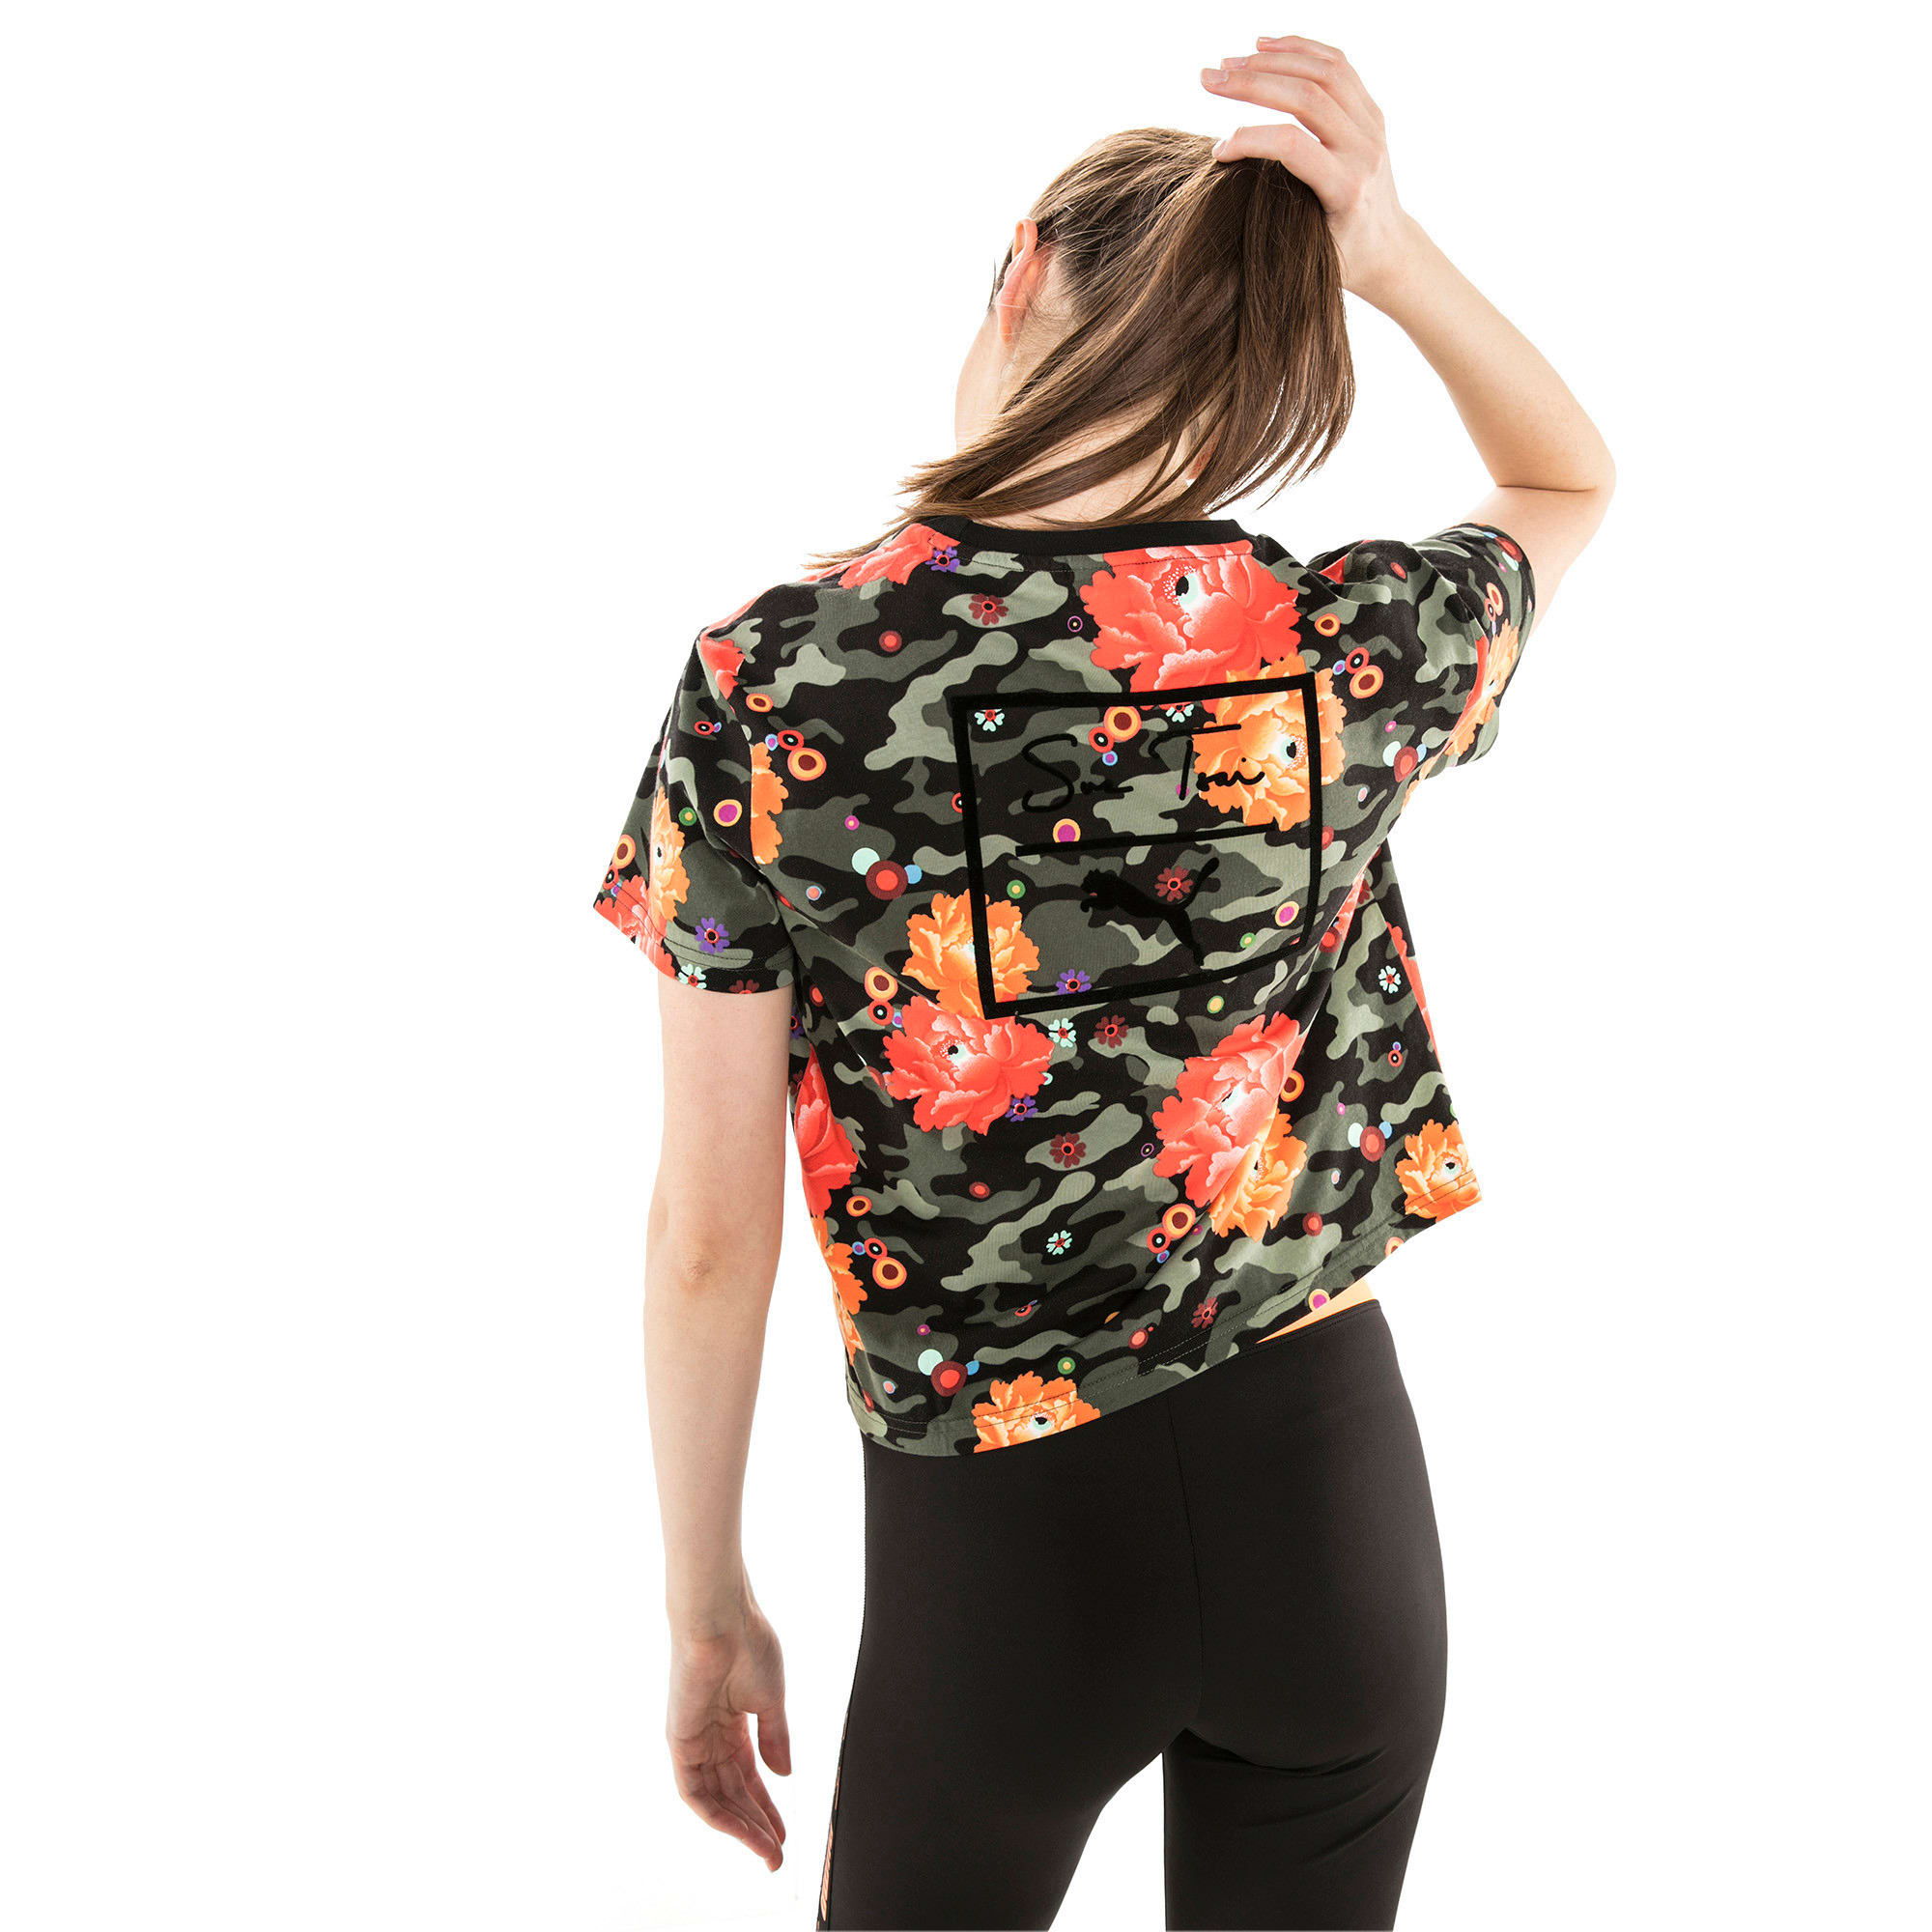 Thumbnail 5 of PUMA x SUE TSAI ウィメンズ  Tシャツ, Puma Black- Peony, medium-JPN